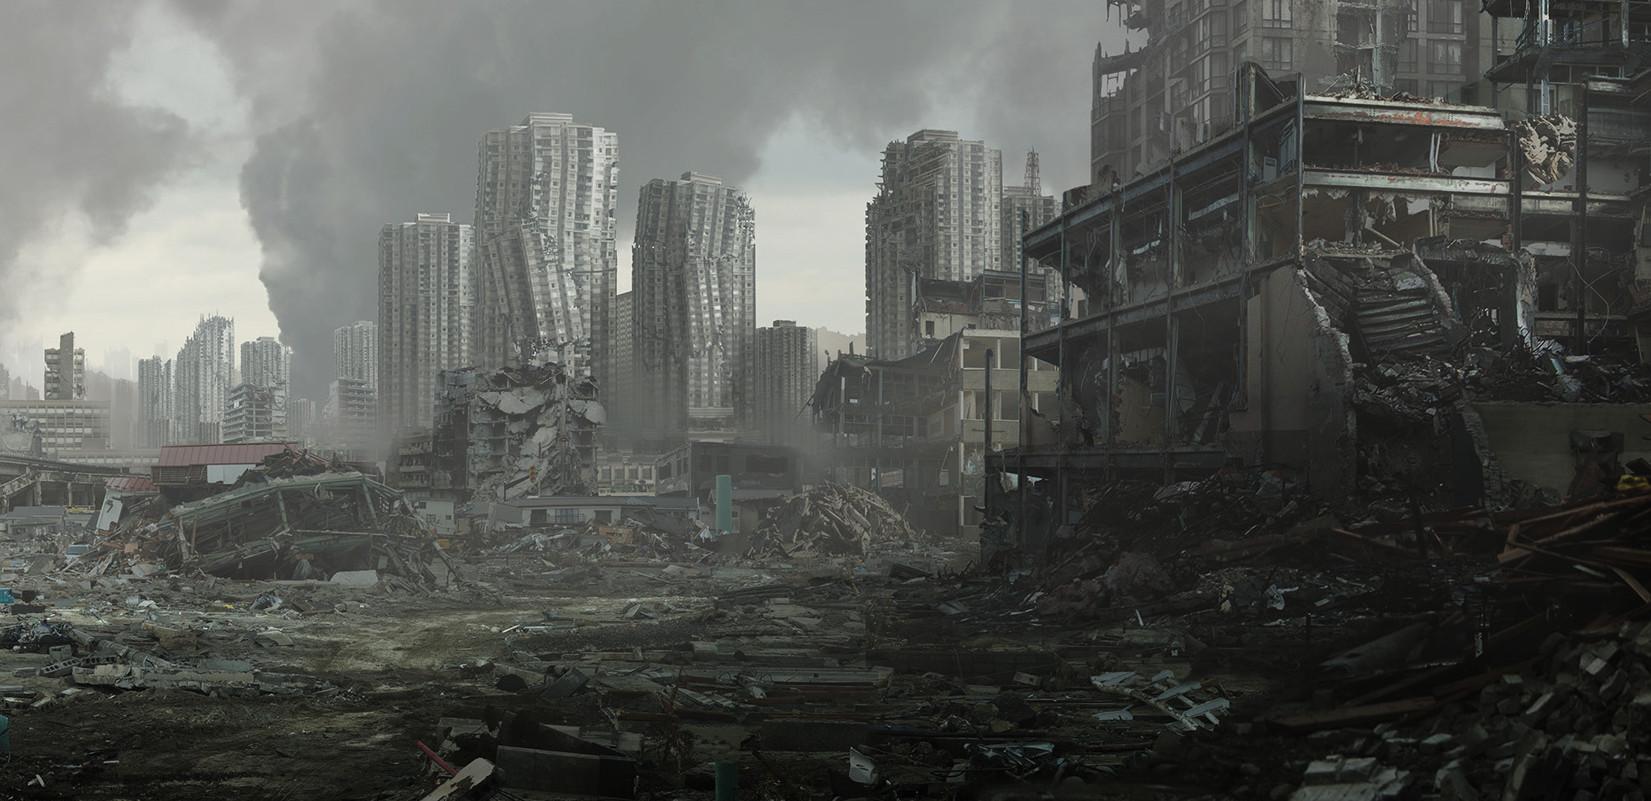 David Edwards City Of Silence 001